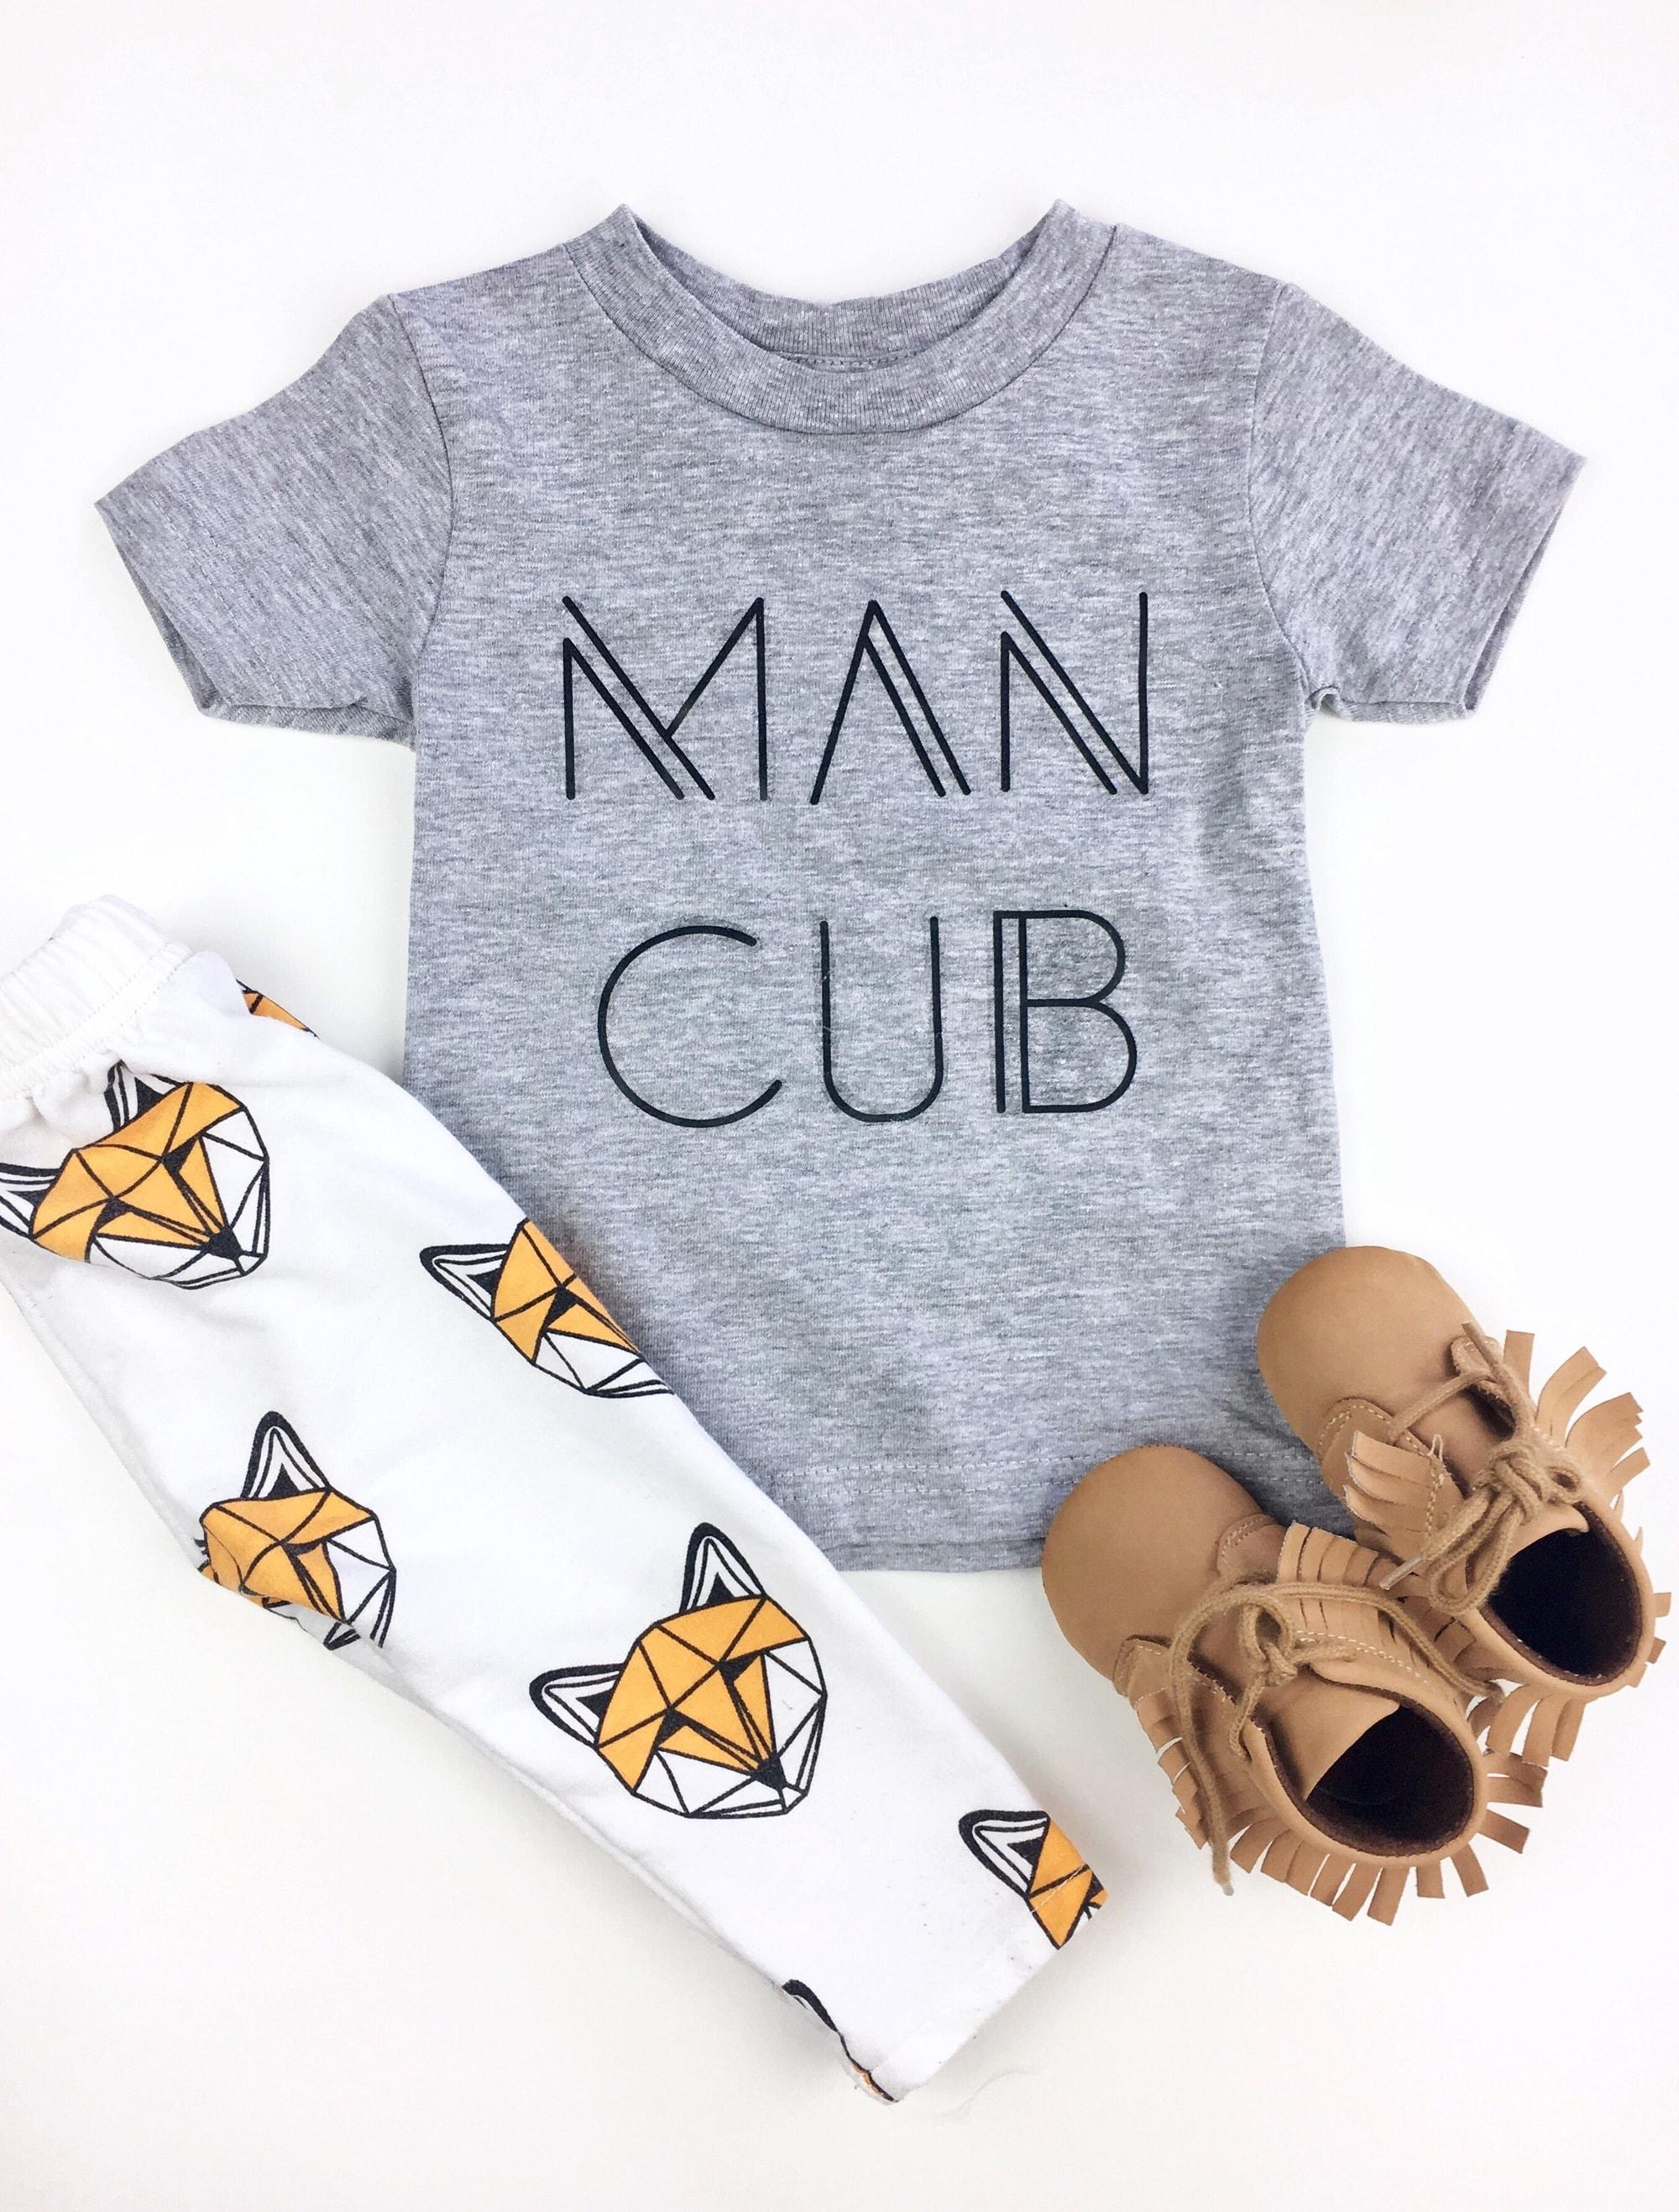 DIY Man Cub Graphic Tee